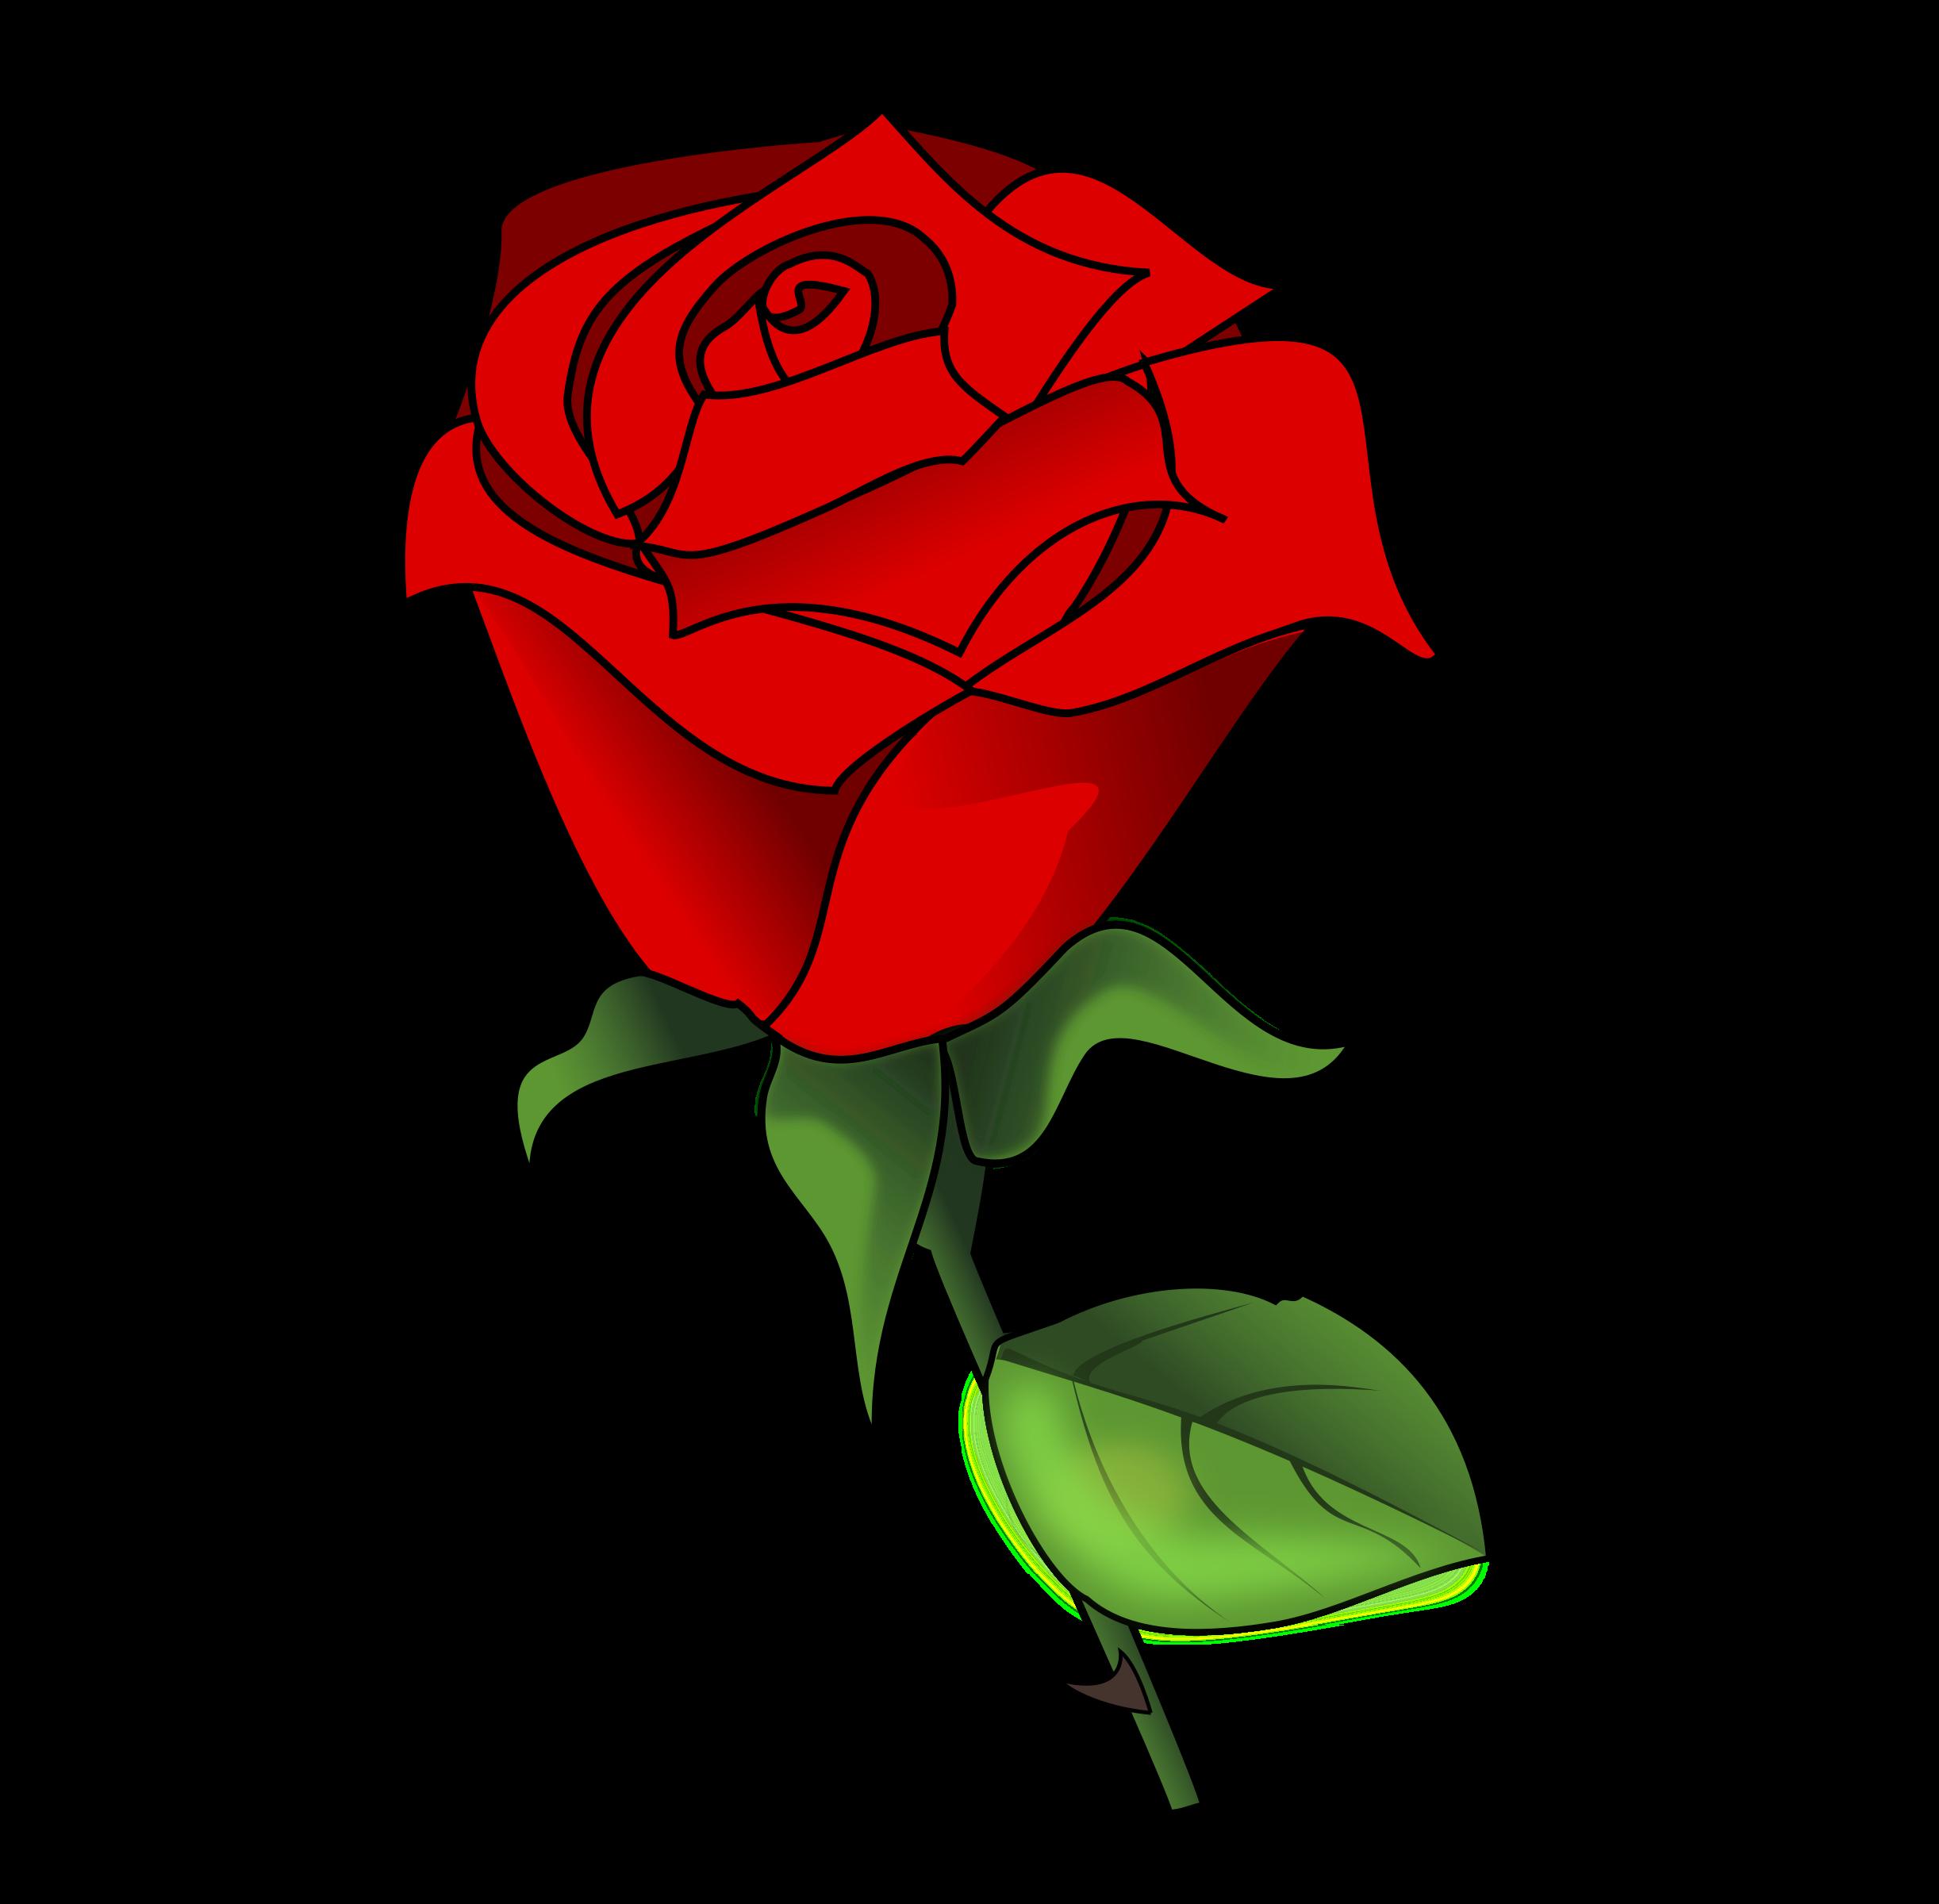 Garden rose clipart - Clipground